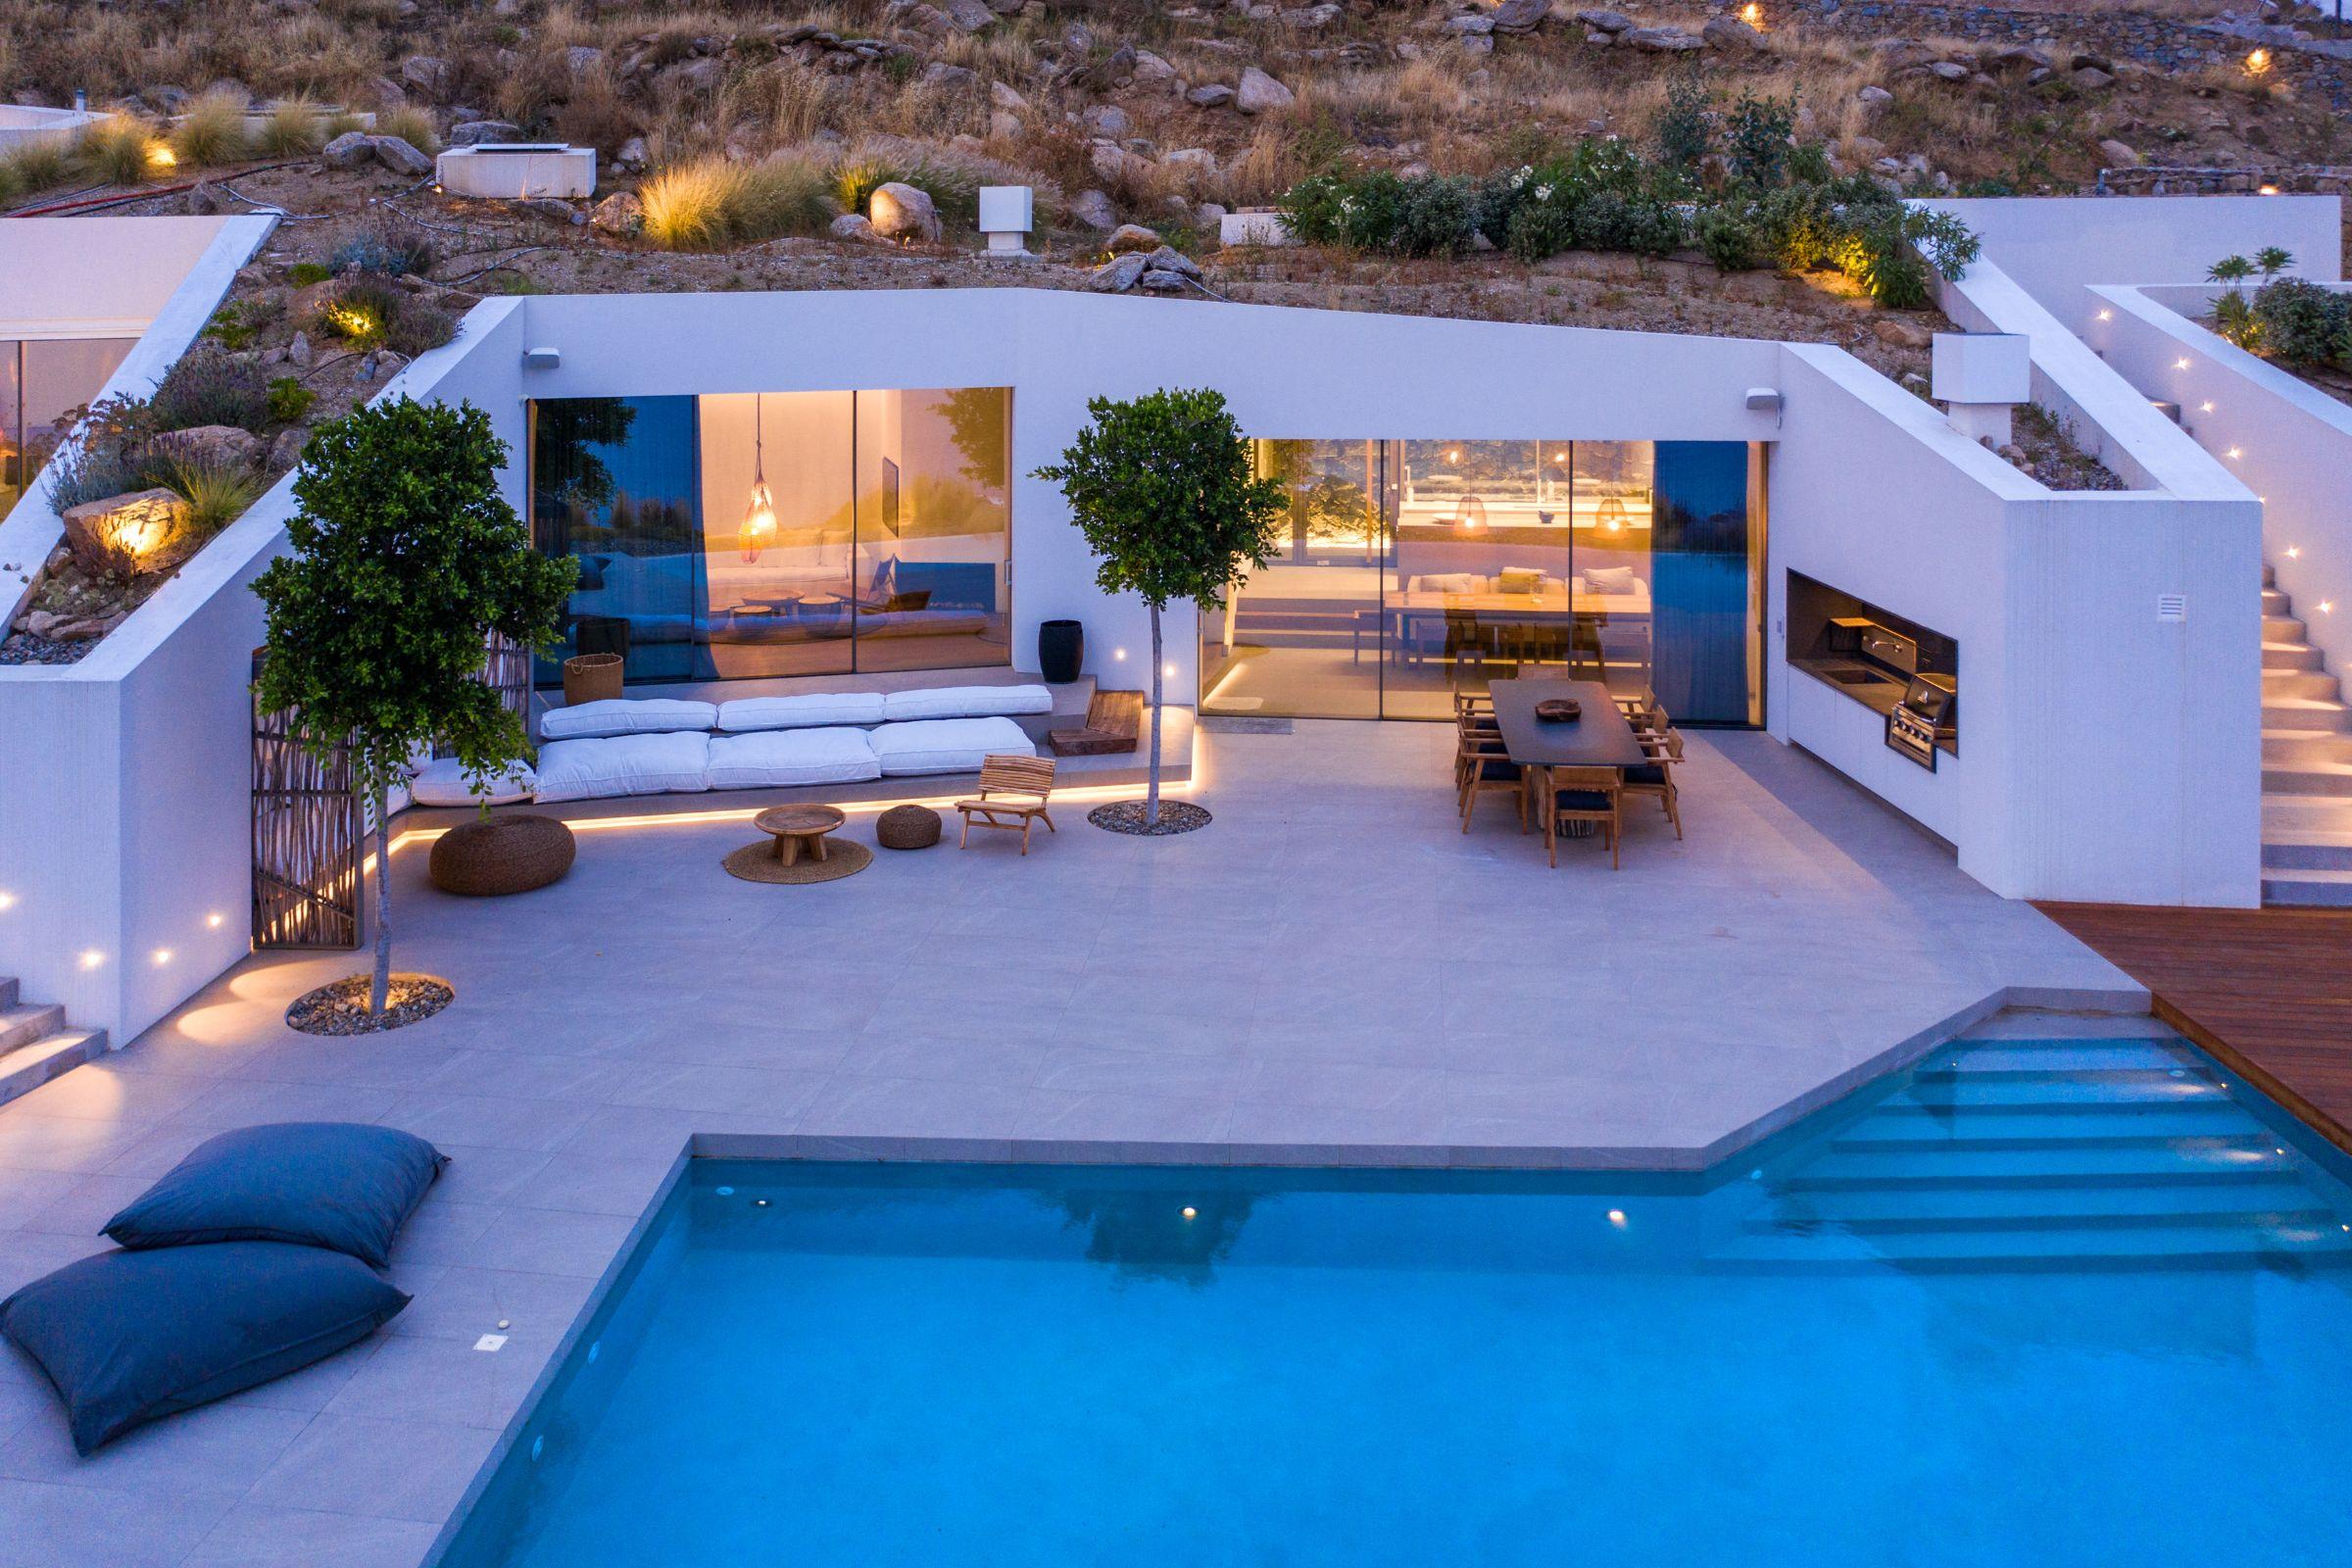 5 bedroom mykonos villas